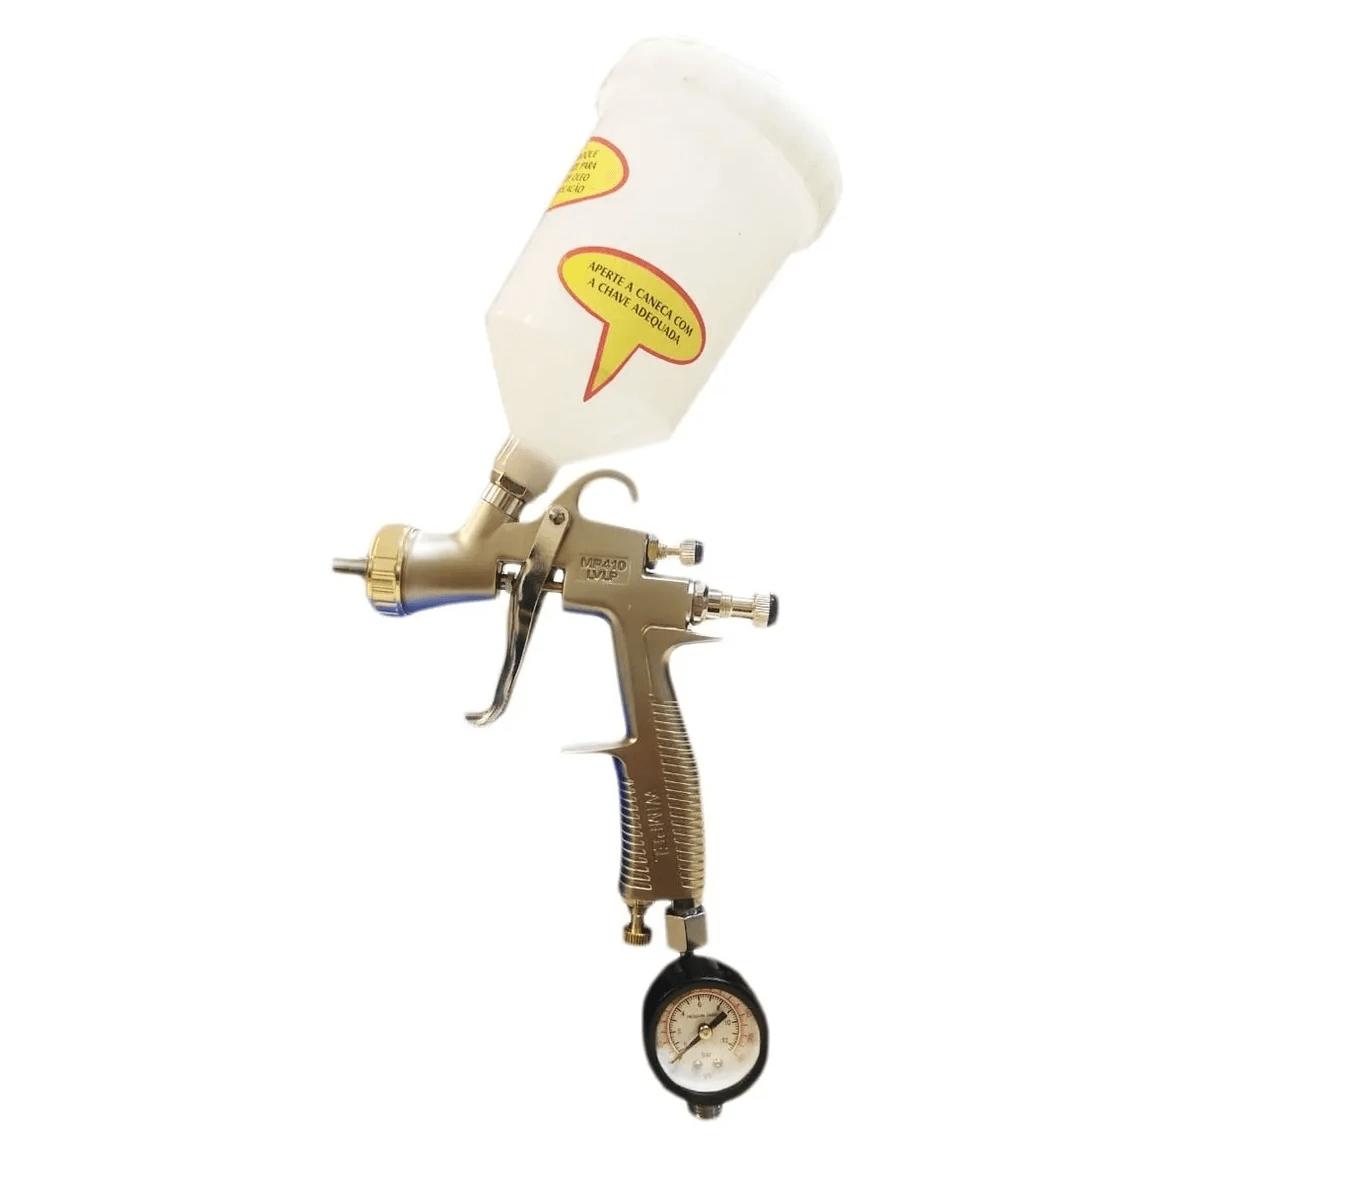 Pistola de Pintura Gravidade LVLP Bico 1.3 mm 600 ml com Maleta WIMPEL MP-410